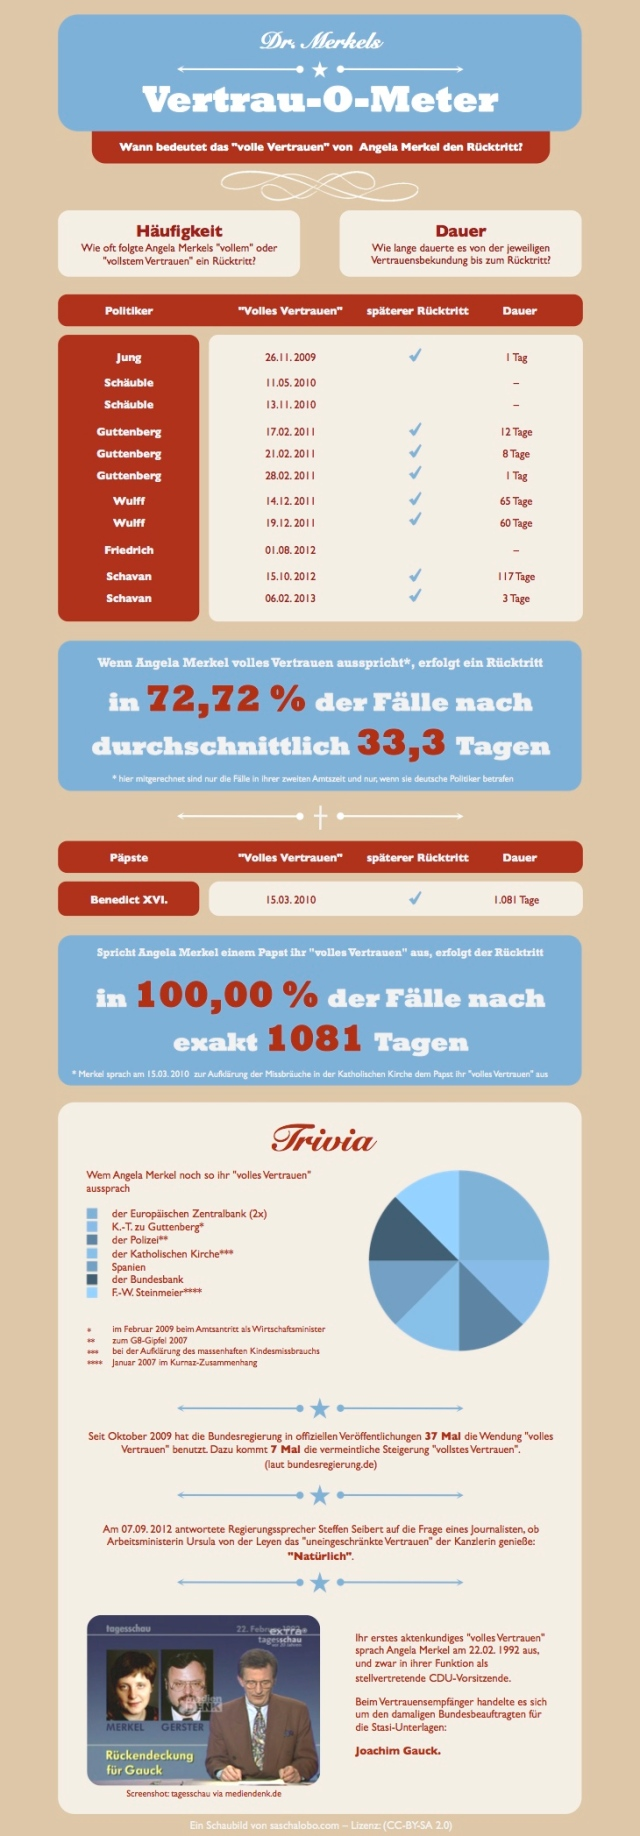 Angela Merkels Vertrau-o-Meter (Papst-Edition) [Bild von saschalobo.com Lizenz: CC-BY-SA 2.0]